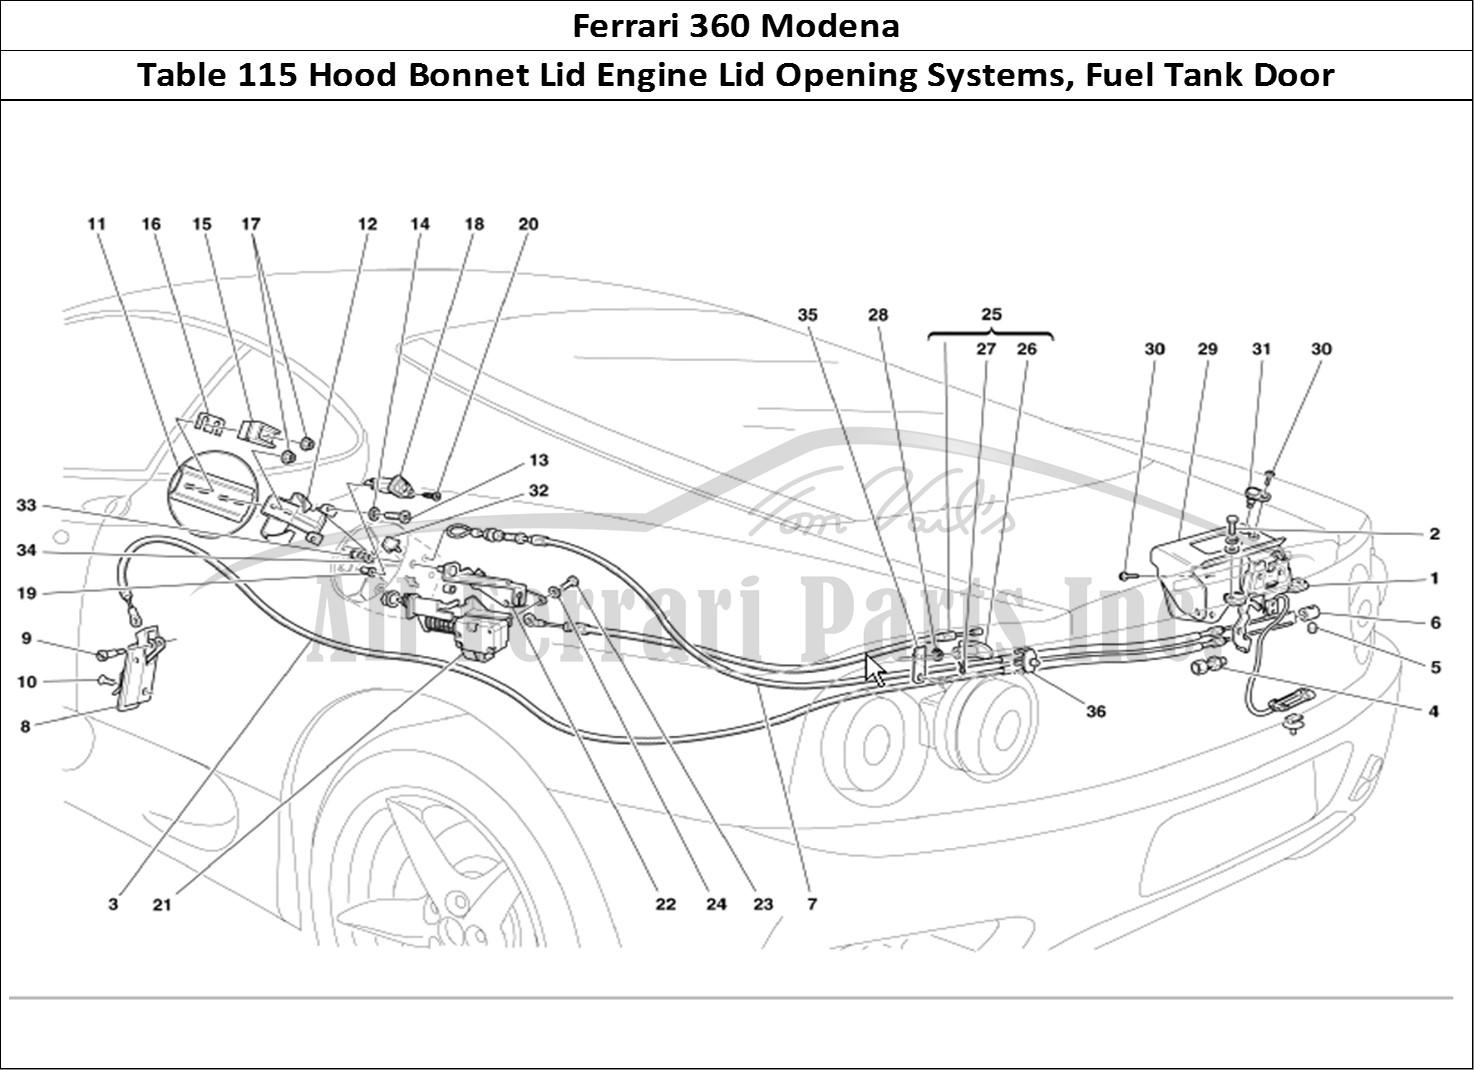 Buy Original Ferrari 360 Modena 115 Hood Bonnet Lid Engine